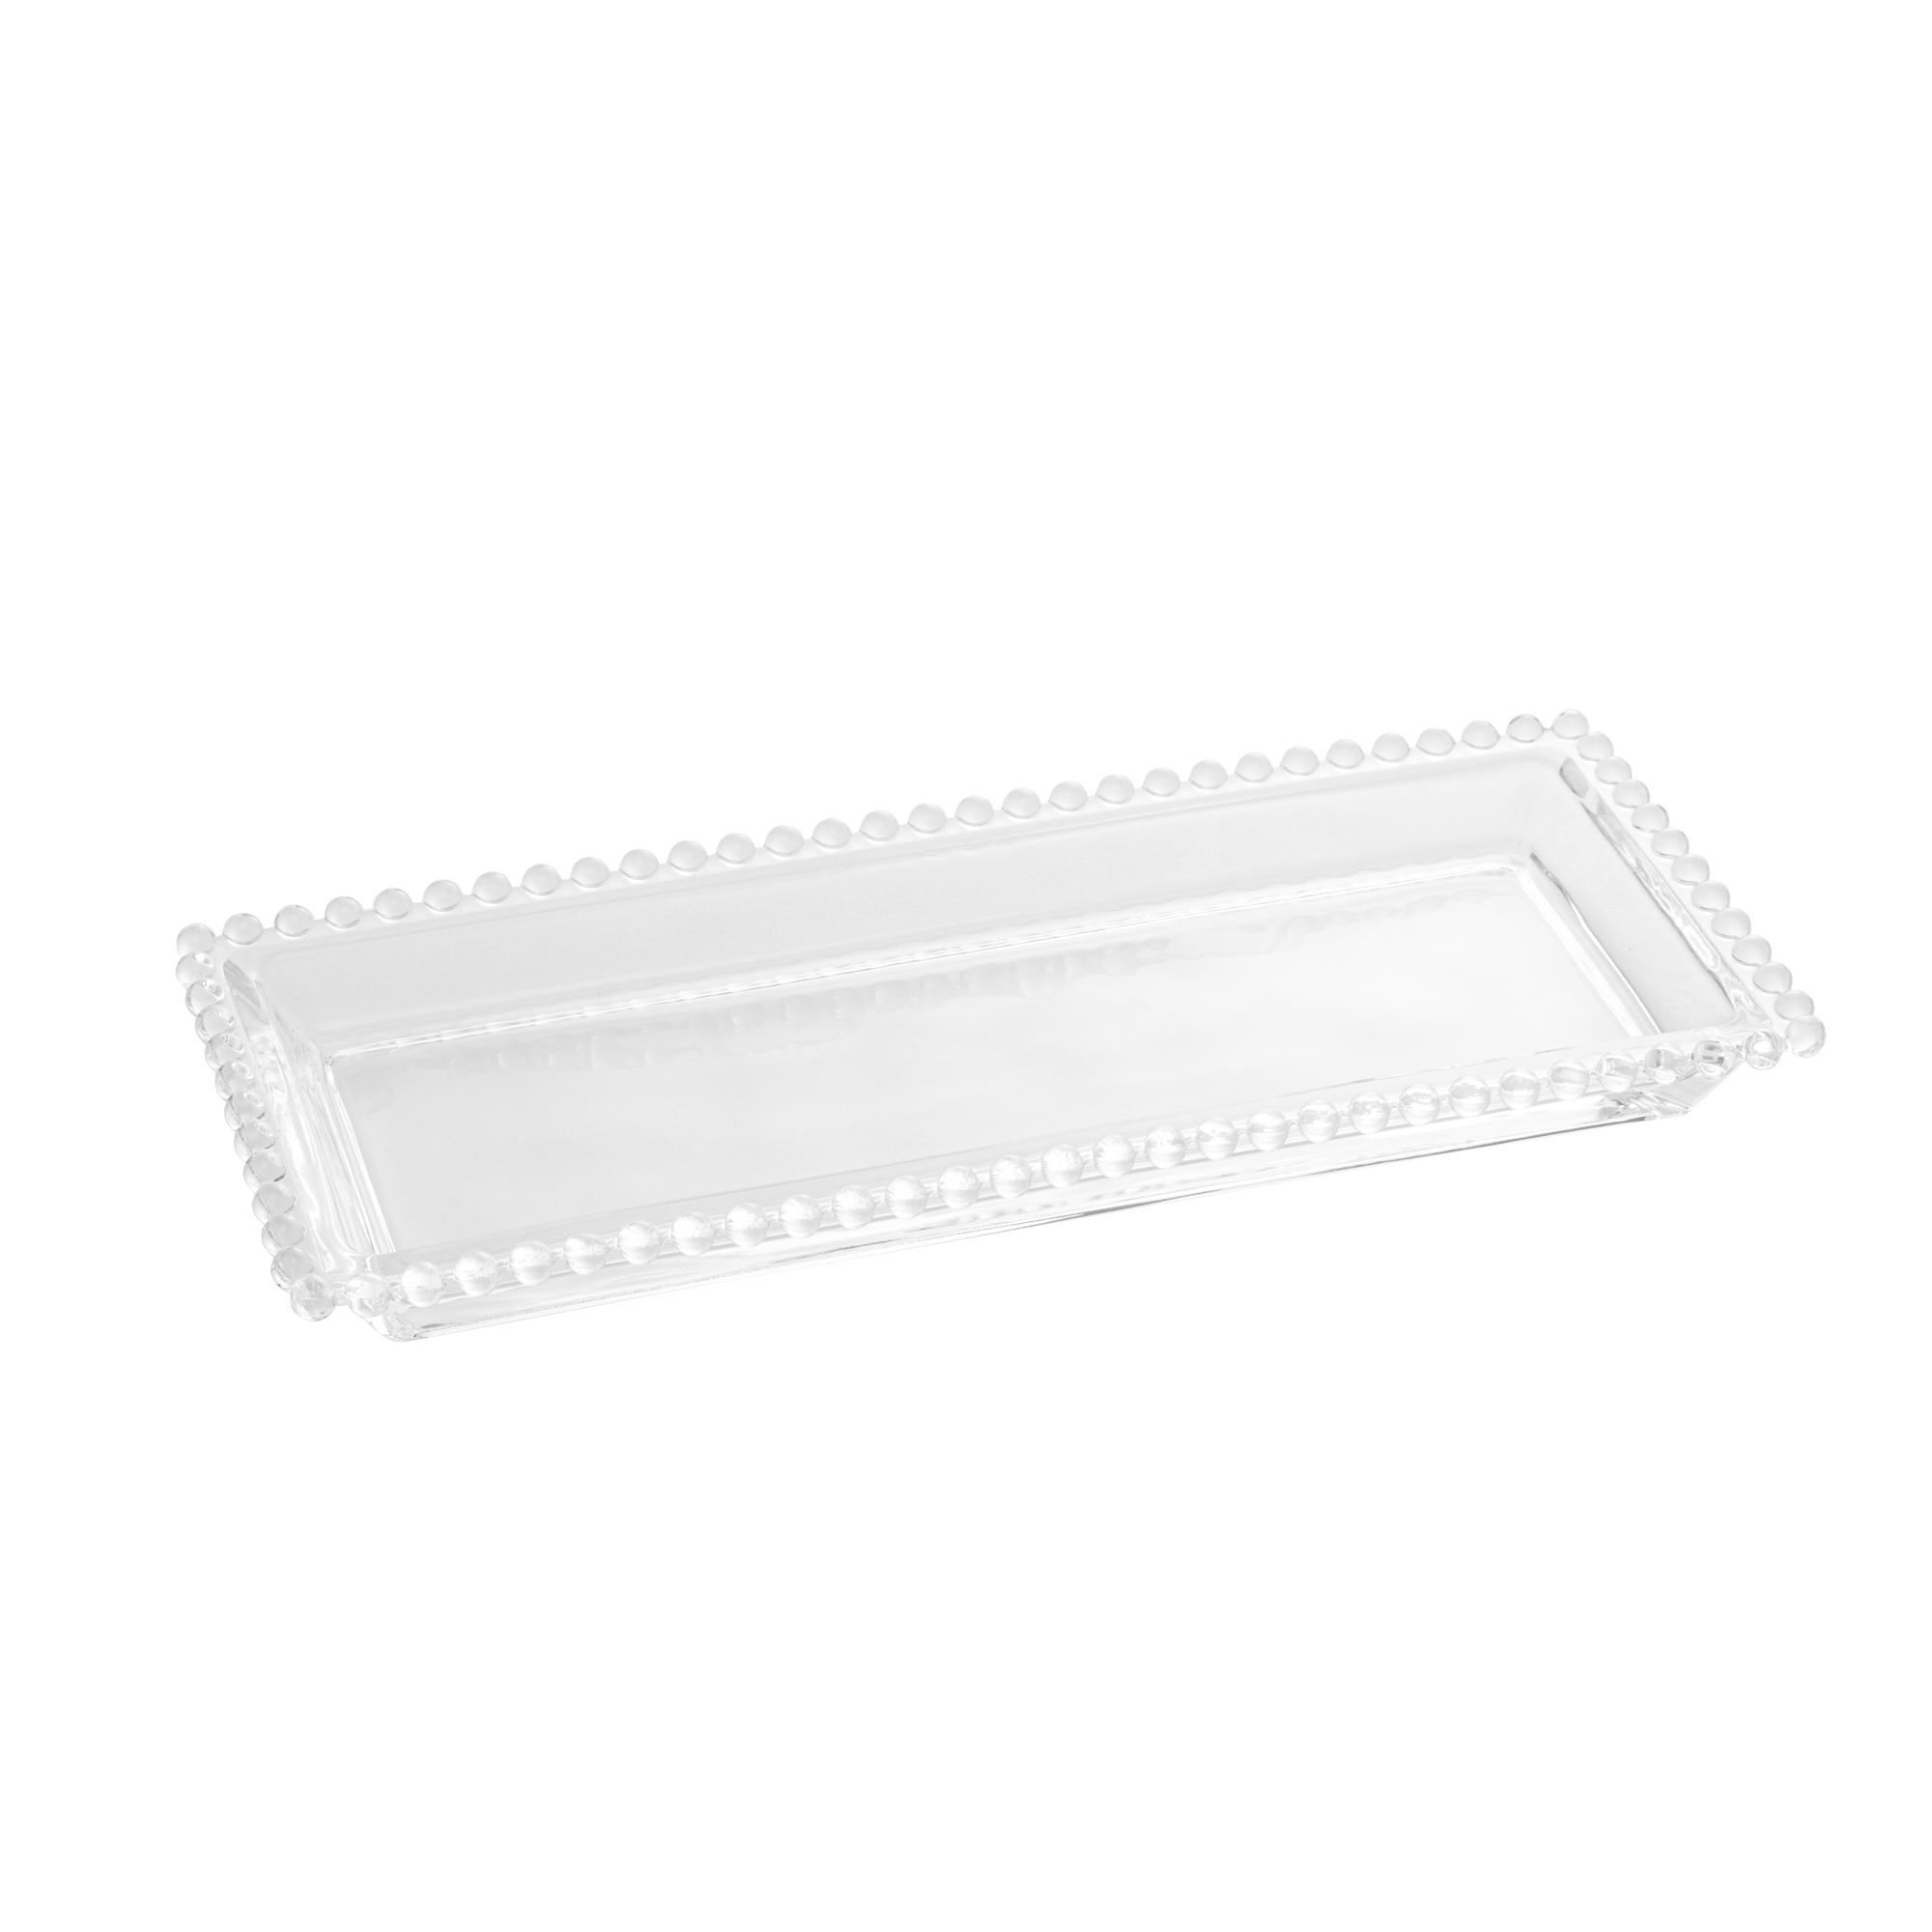 Travessa de Cristal de Chumbo Pearl 30x13x3cm - Wolff  - Haus In